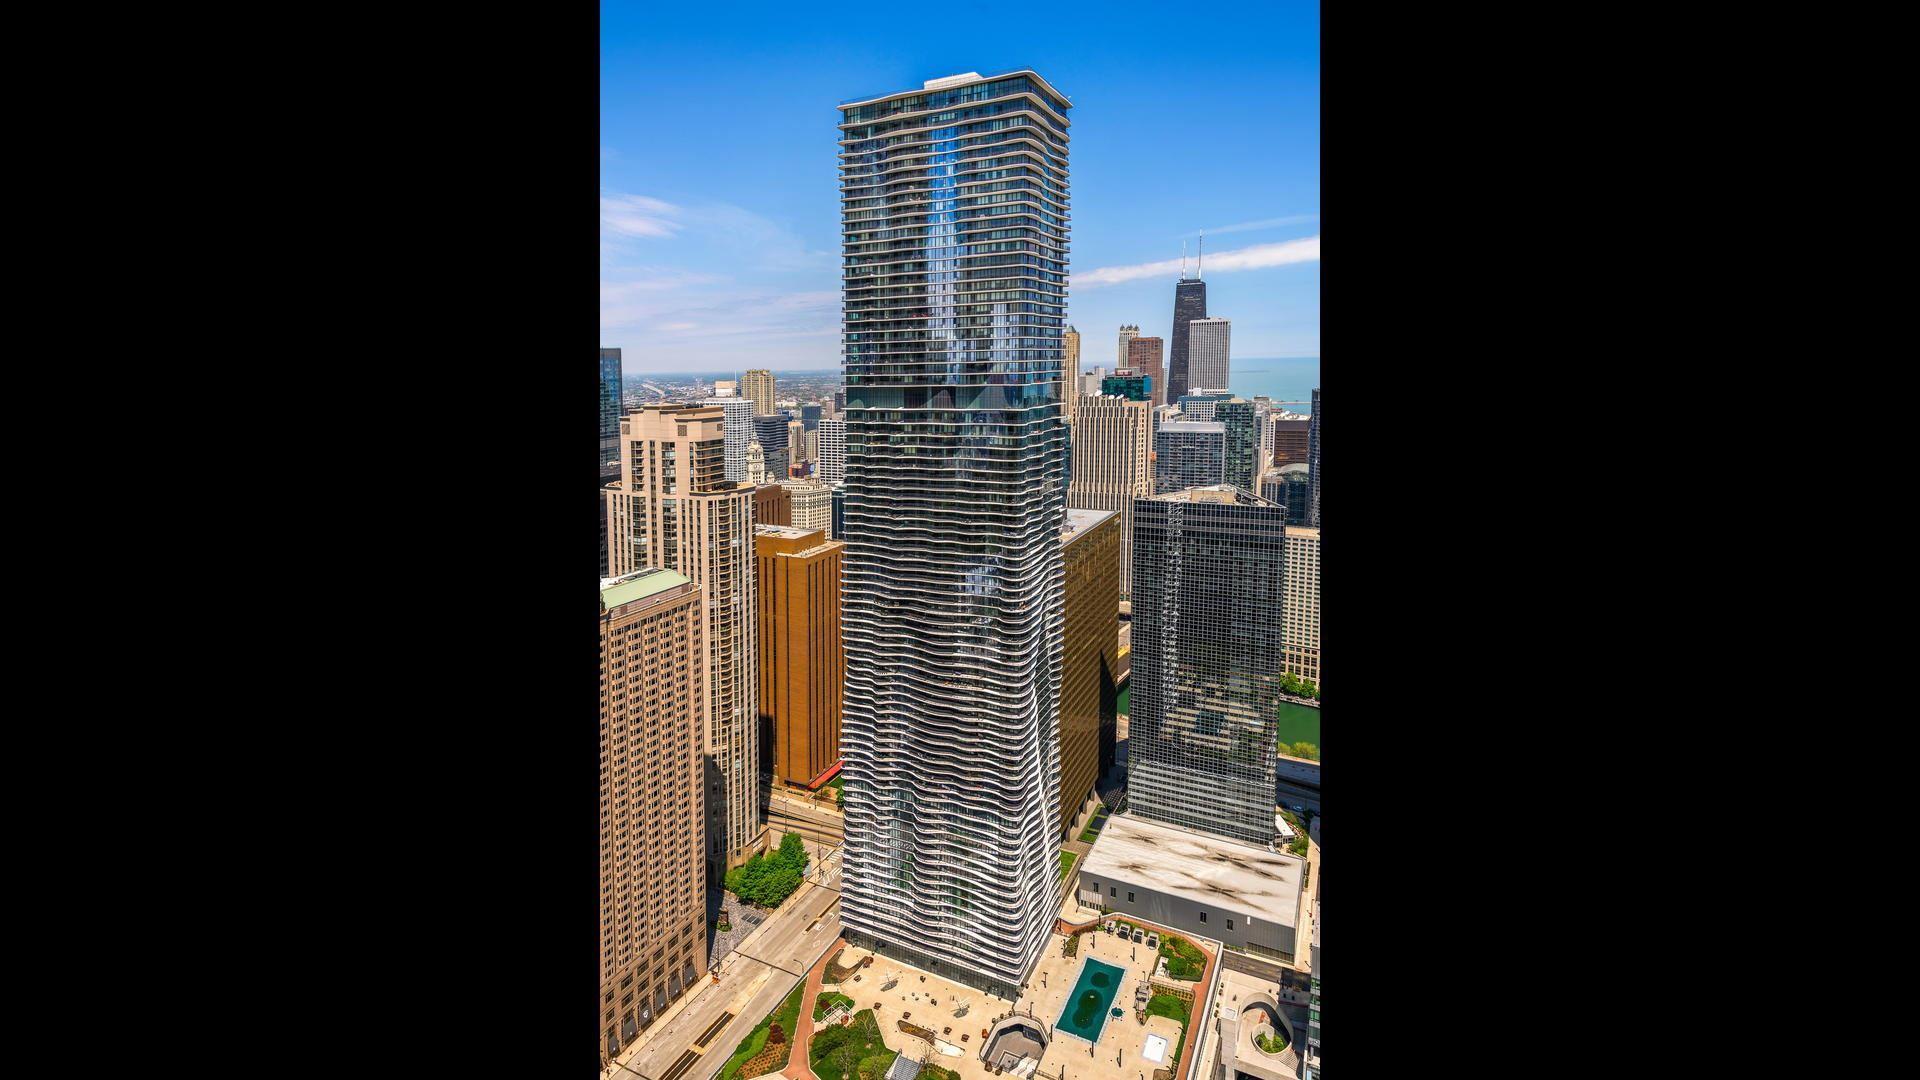 225 N COLUMBUS Drive #6102, Chicago, IL 60601 - #: 10756066